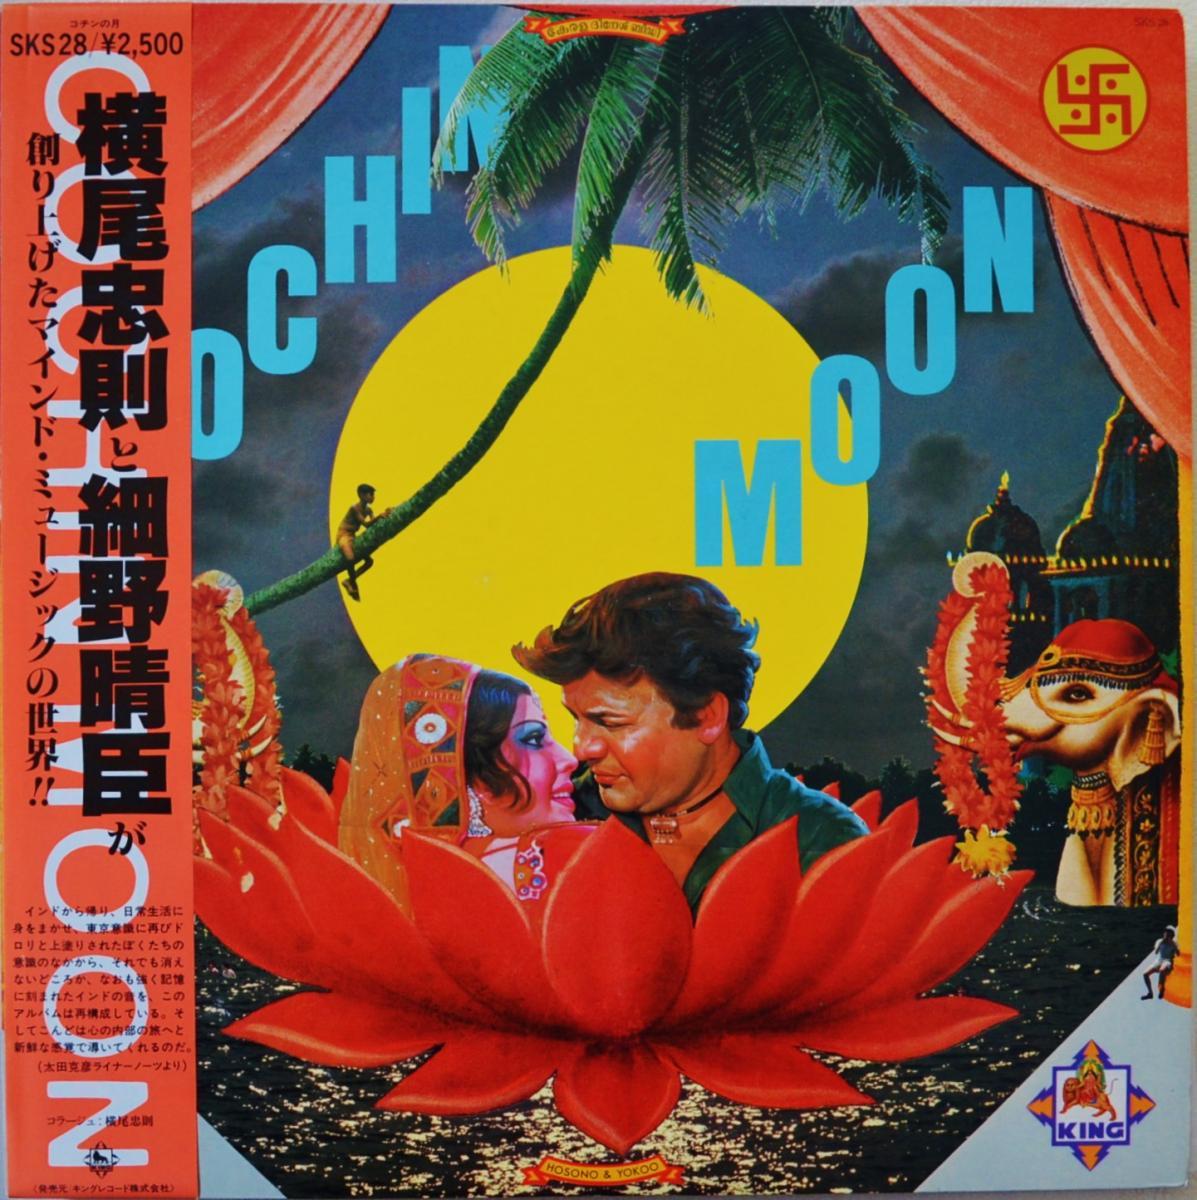 HOSONO & YOKOO / HARUOMI HOSONO & TADANORI YOKOO (細野晴臣 & 横尾忠則) / コチンの月 COCHIN MOON (LP)